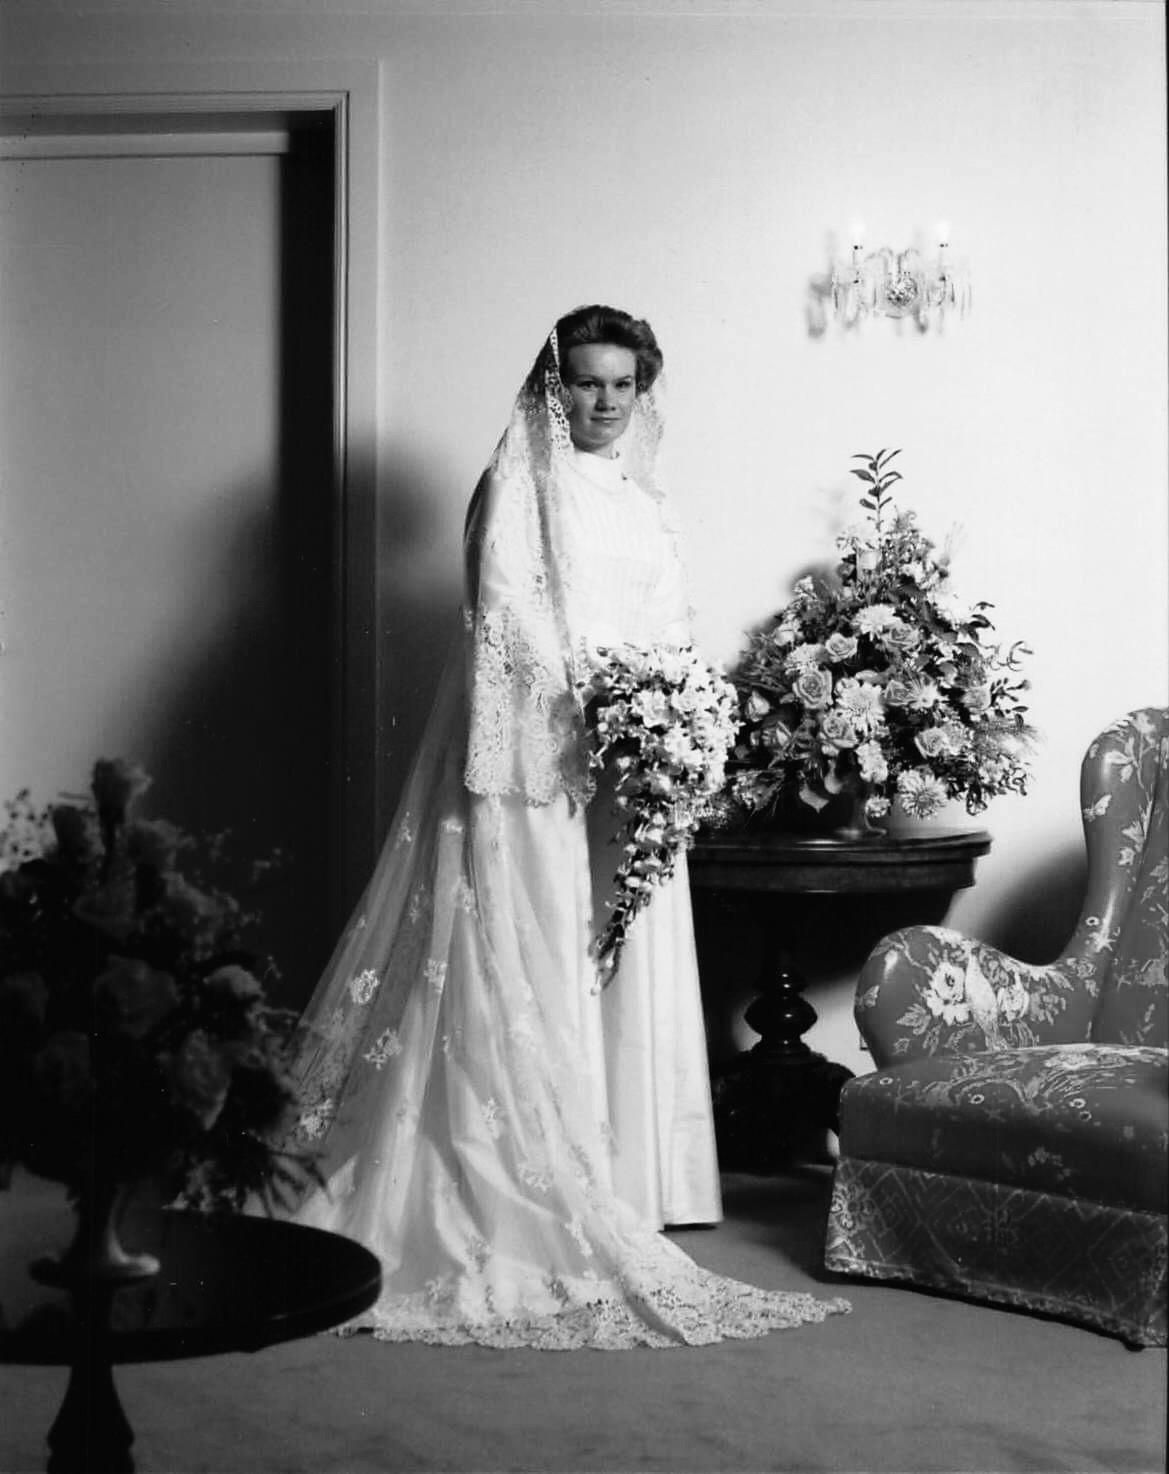 Anne wedding 1984 with veil